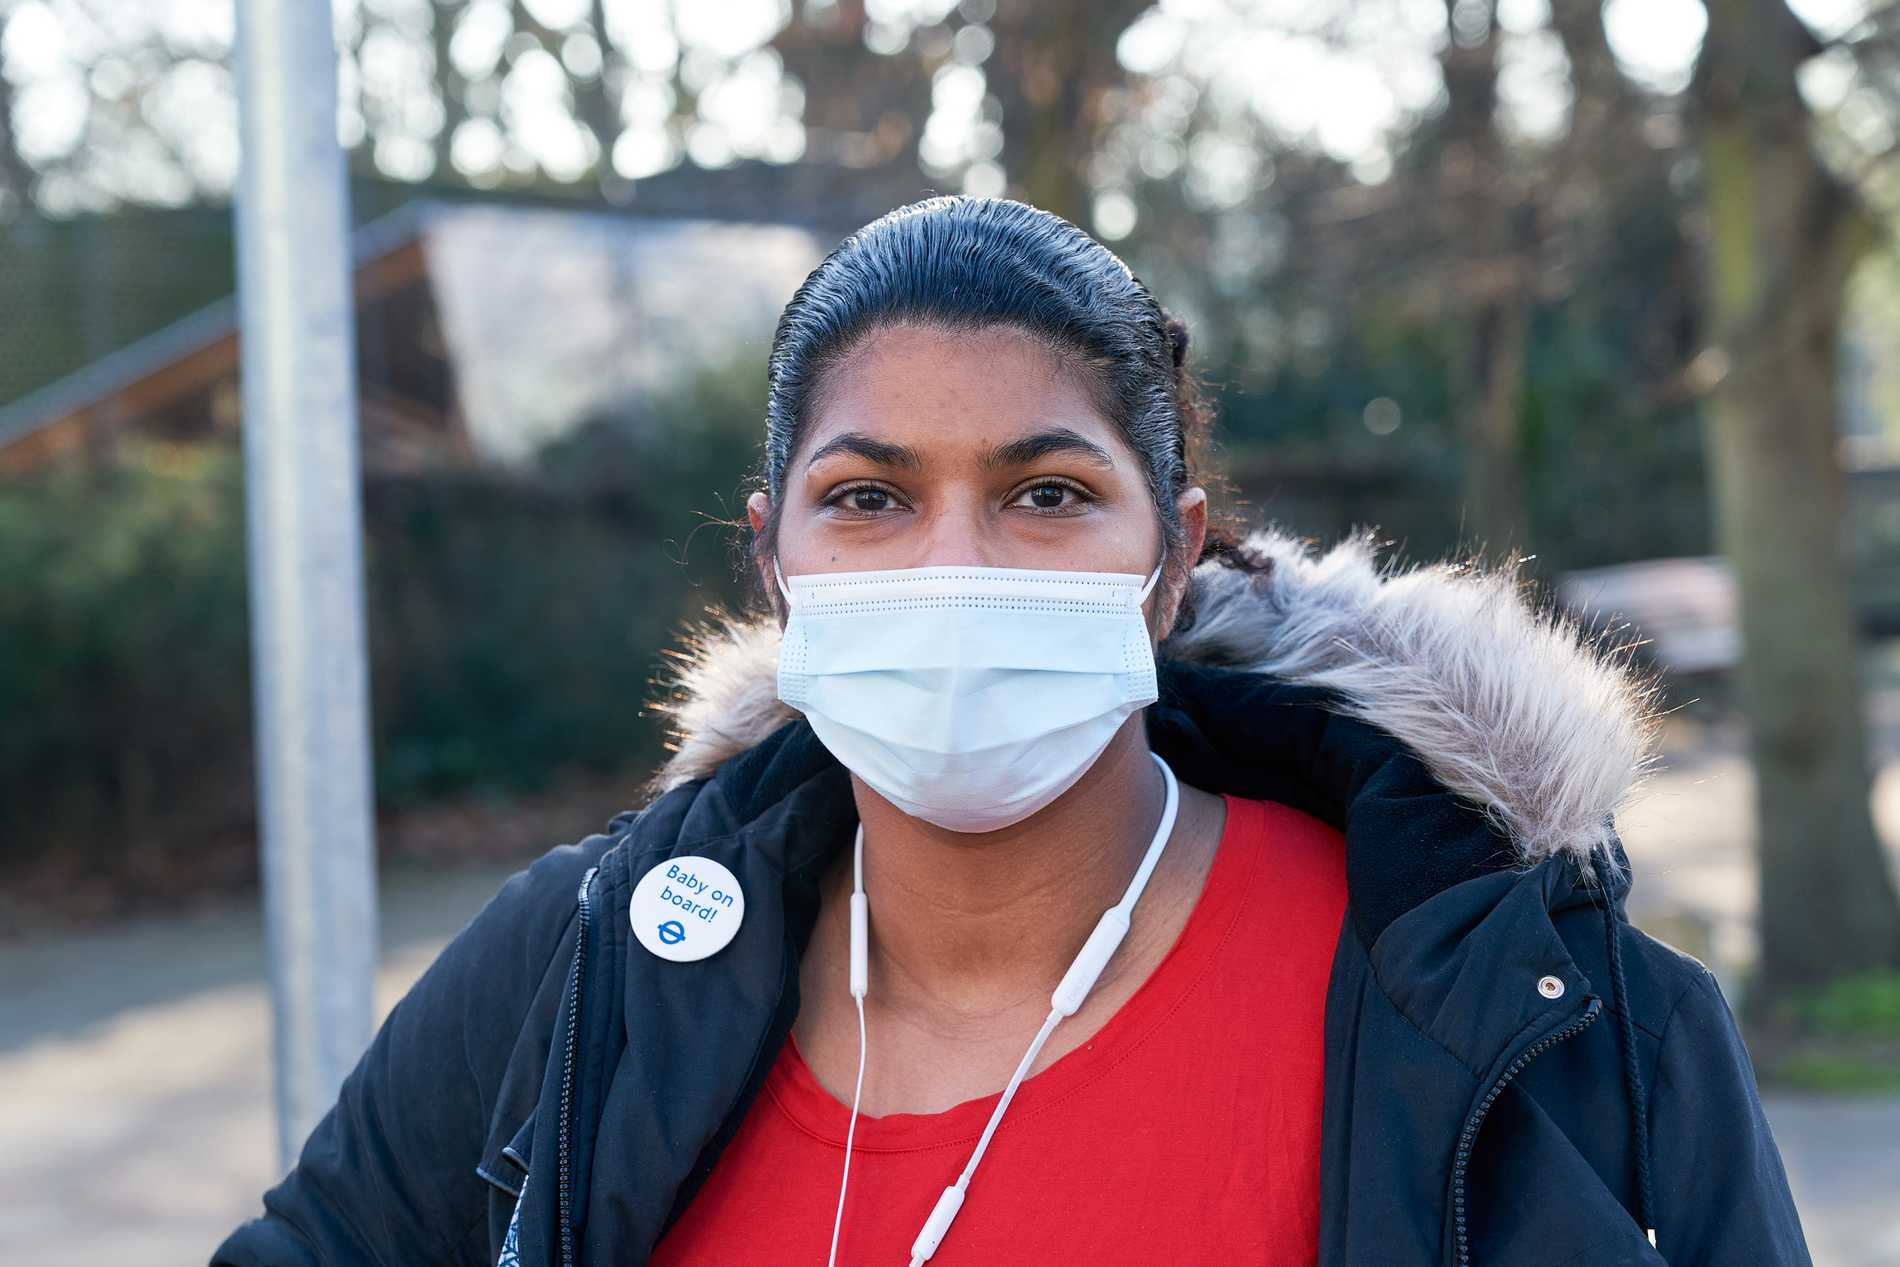 Rehana Ruette ska föda barn i februari, på ett sjukhus tyngt av covidsjuka.